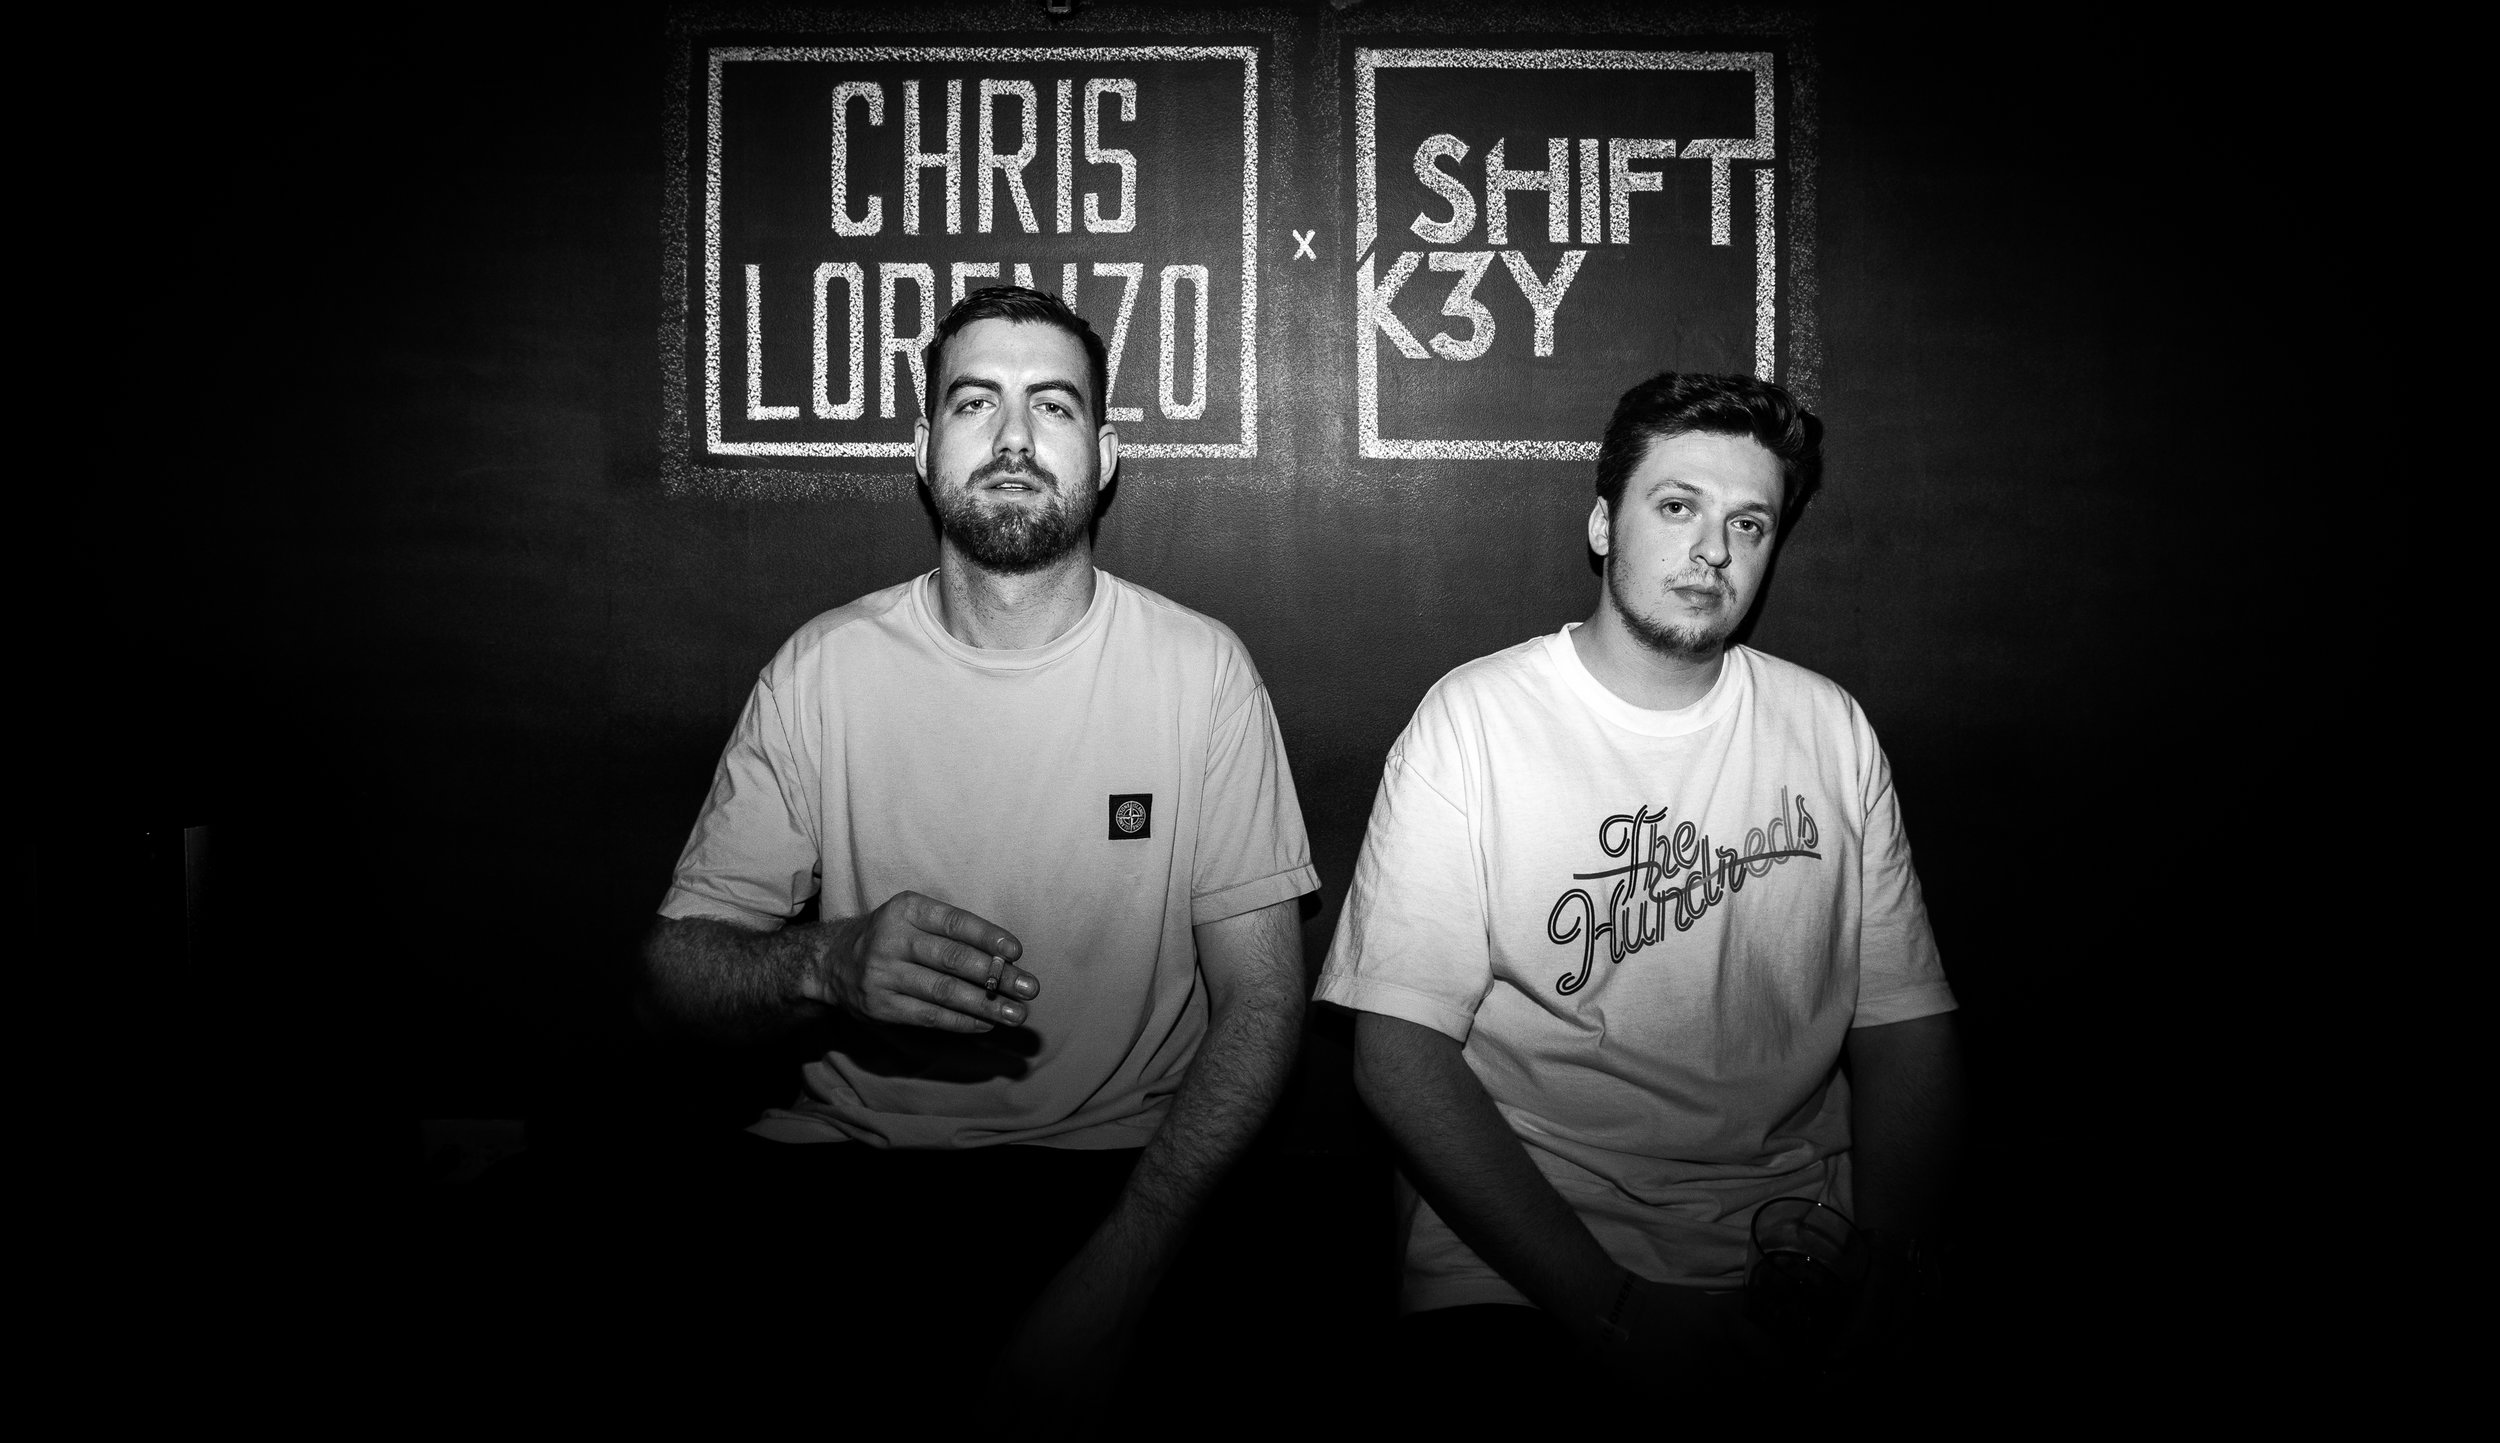 Chris Lorenzo x Shiftk3y Tour